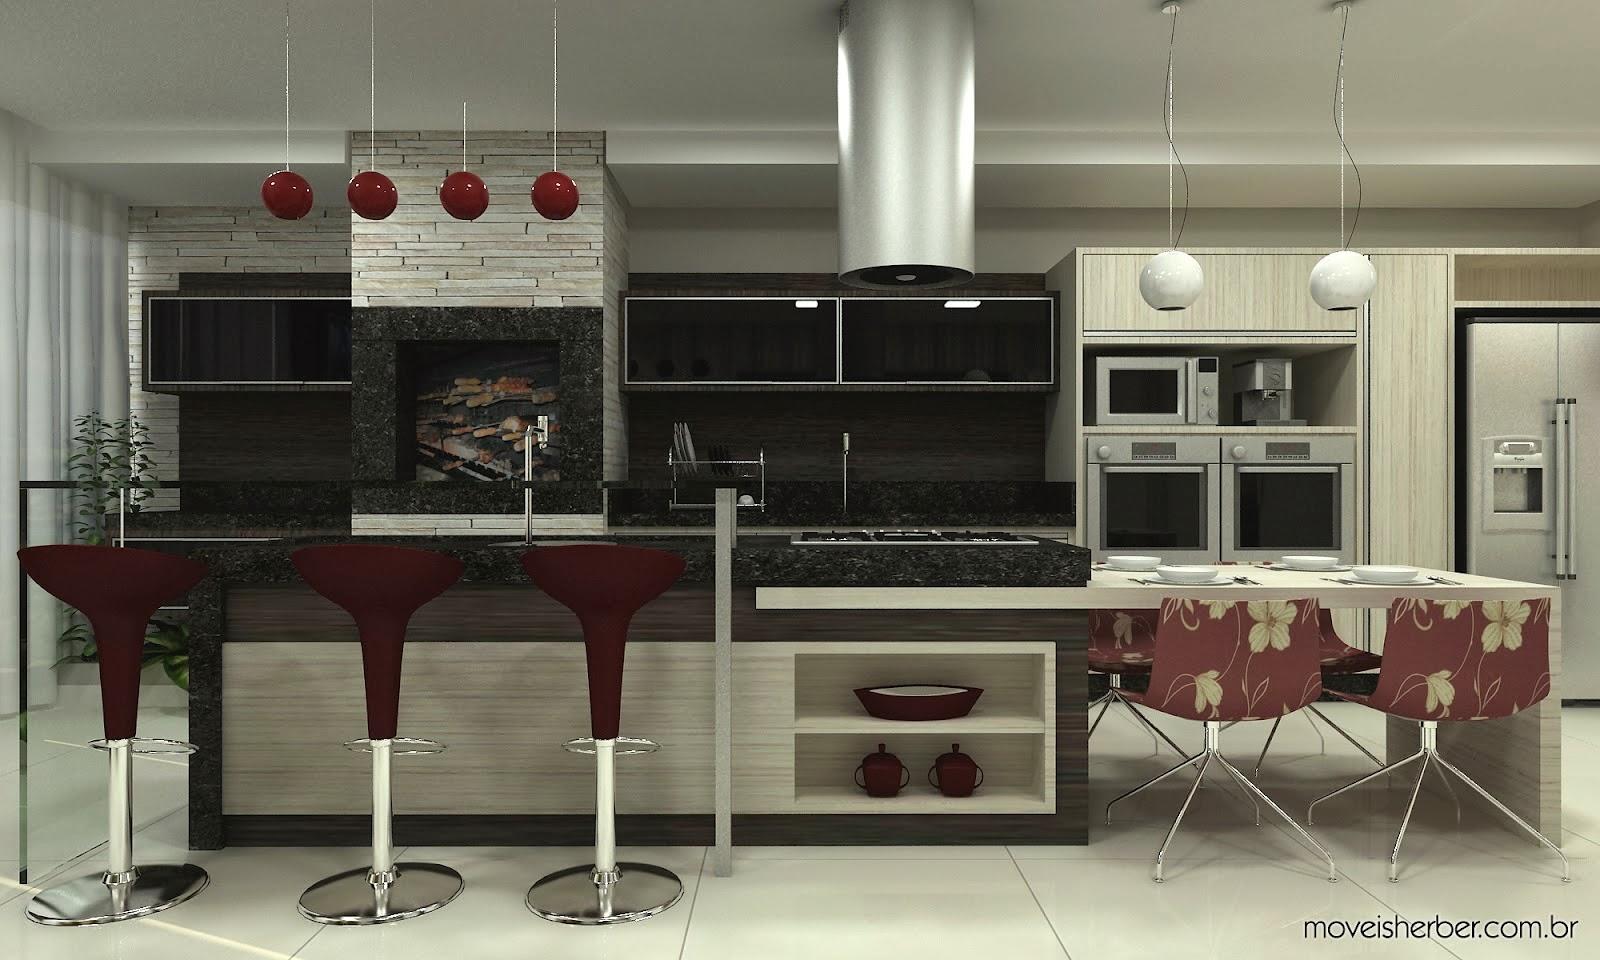 #604038 Balcao De Tijolo Vidro Cozinha Americana Com Balcao De Tijolo Vidro 1600x960 px Bancada Cozinha Americana Tijolo Vidro #1307 imagens